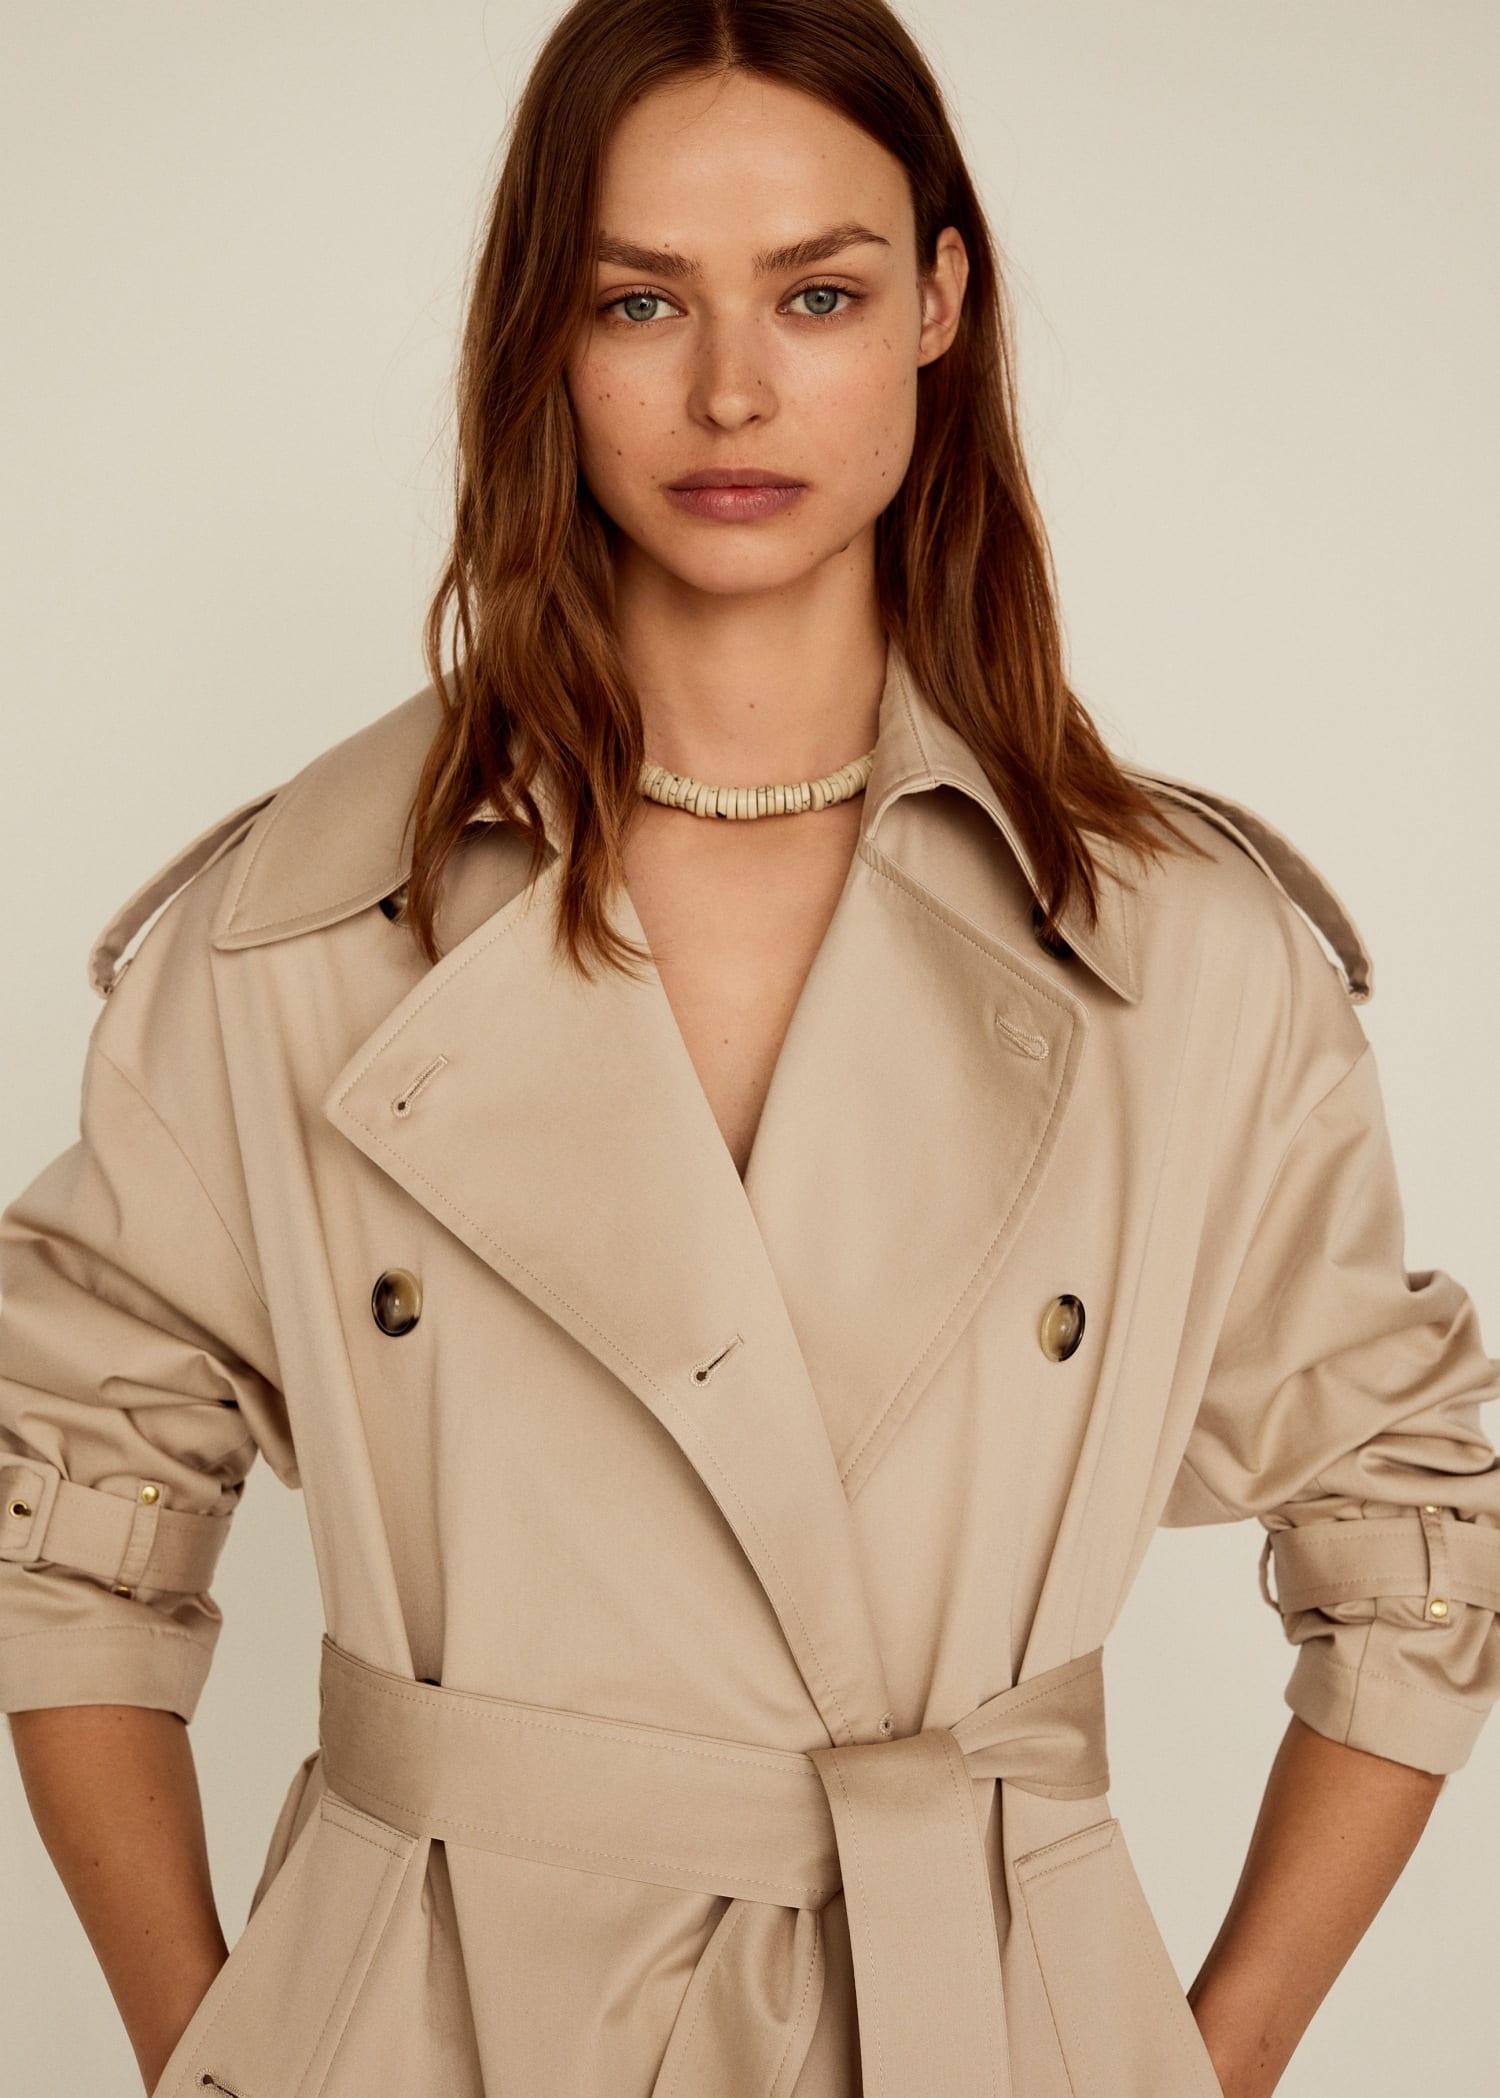 Women Single-Breasted Trench Coat Full Length Overcoat Belt Sand Collar Outwear